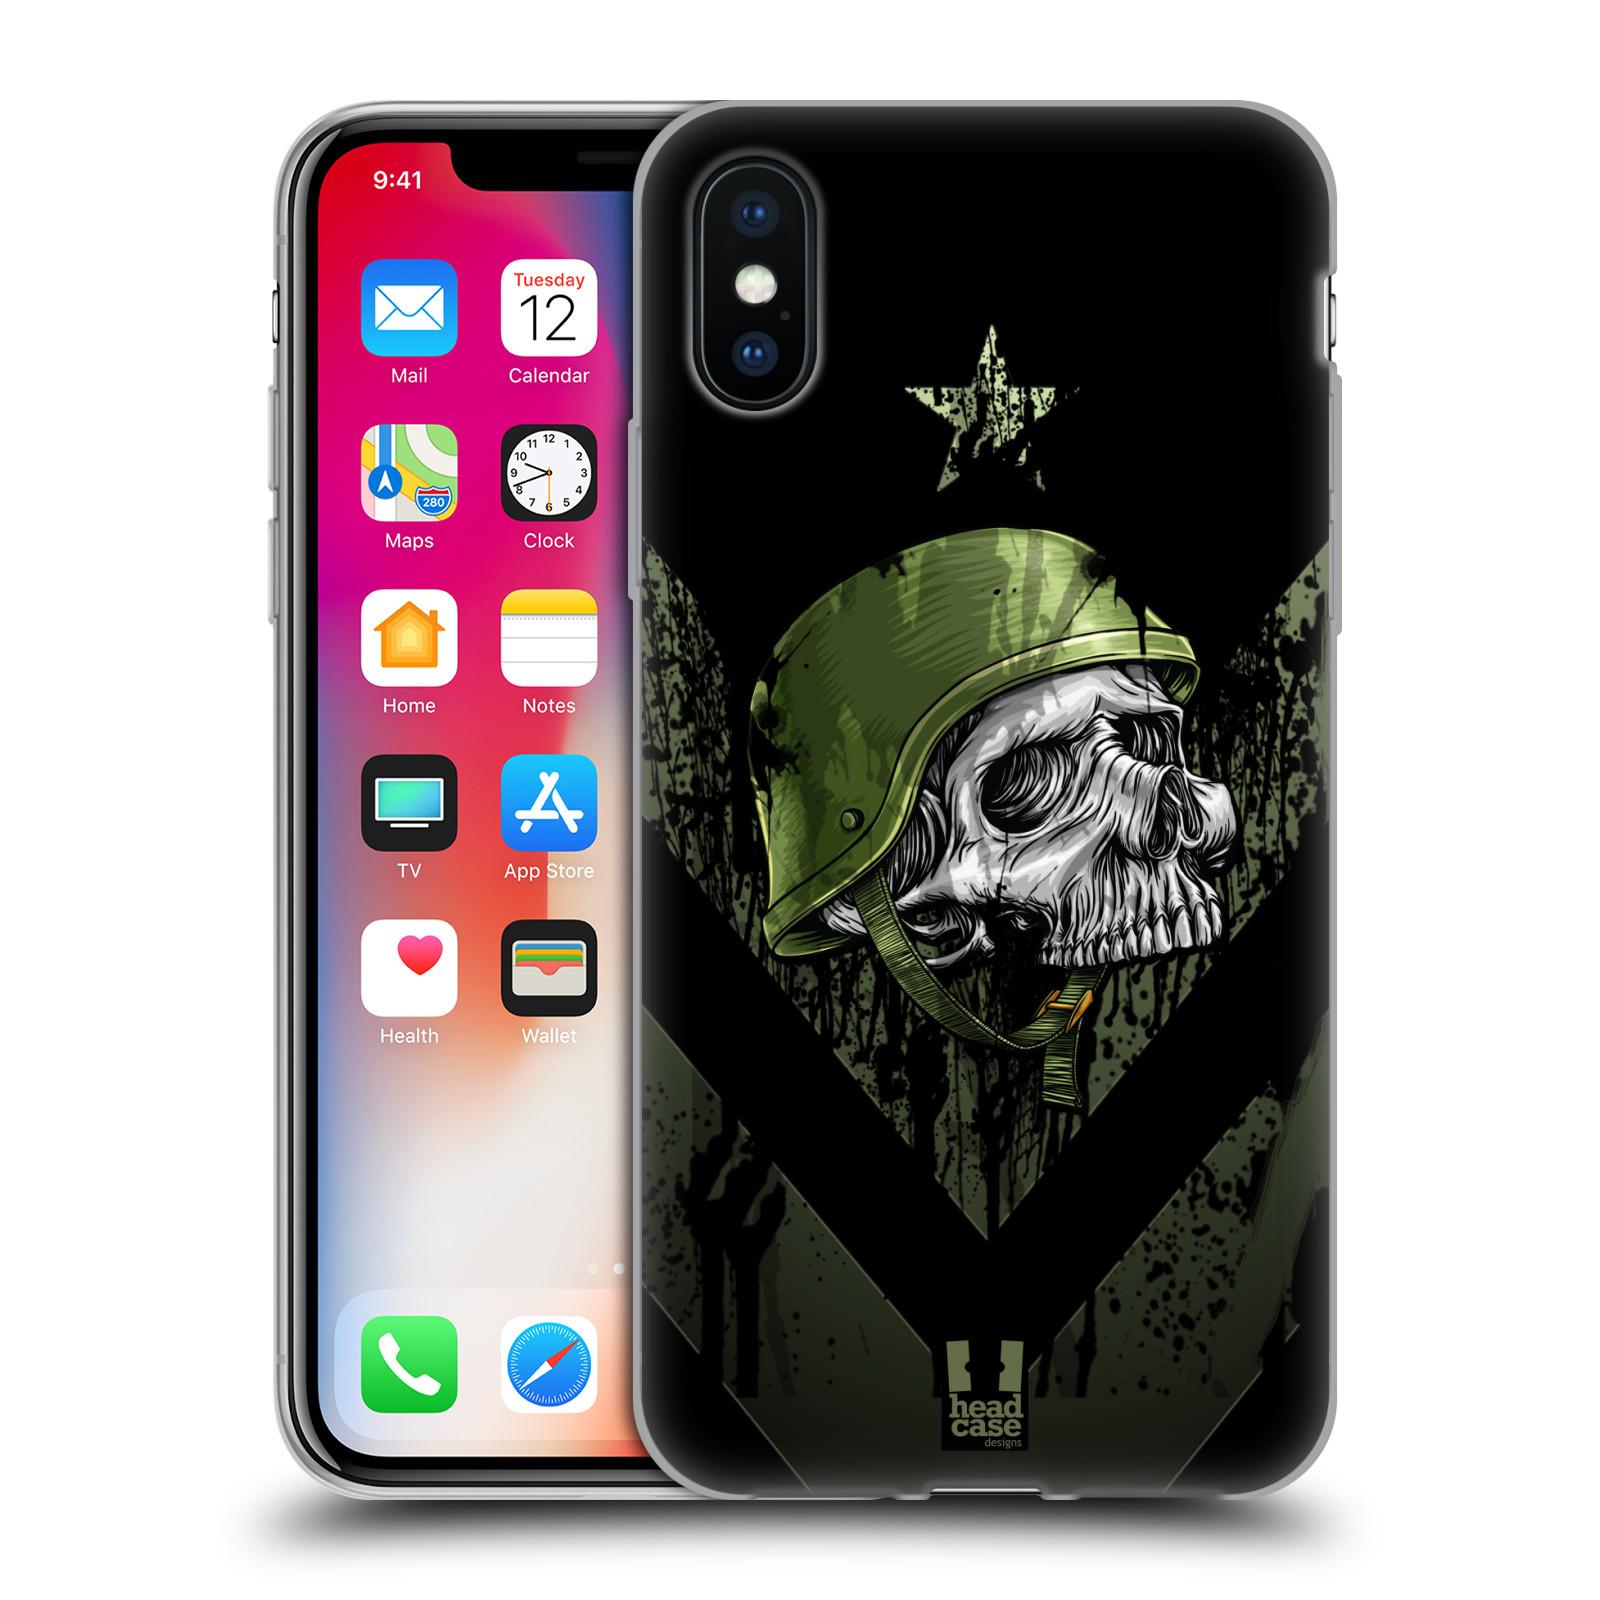 Silikonové pouzdro na mobil Apple iPhone X - Head Case - LEBKA ONE MAN